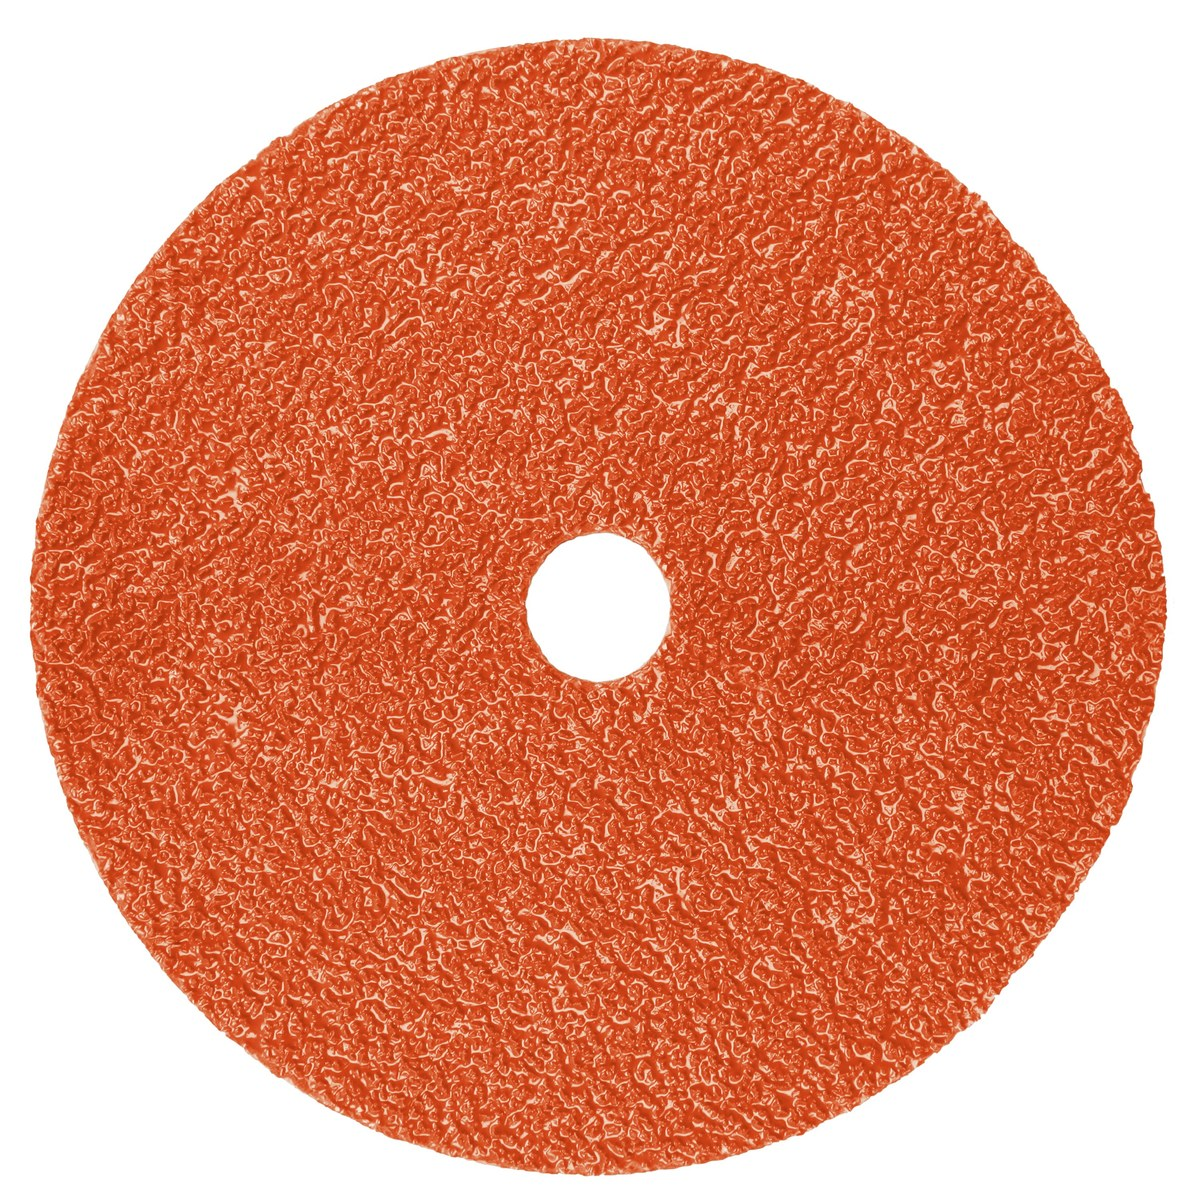 2 in Disc Dia 14 Units Standard Abrasives Non-Woven Finishing Disc Aluminum Oxide 20000 RPM